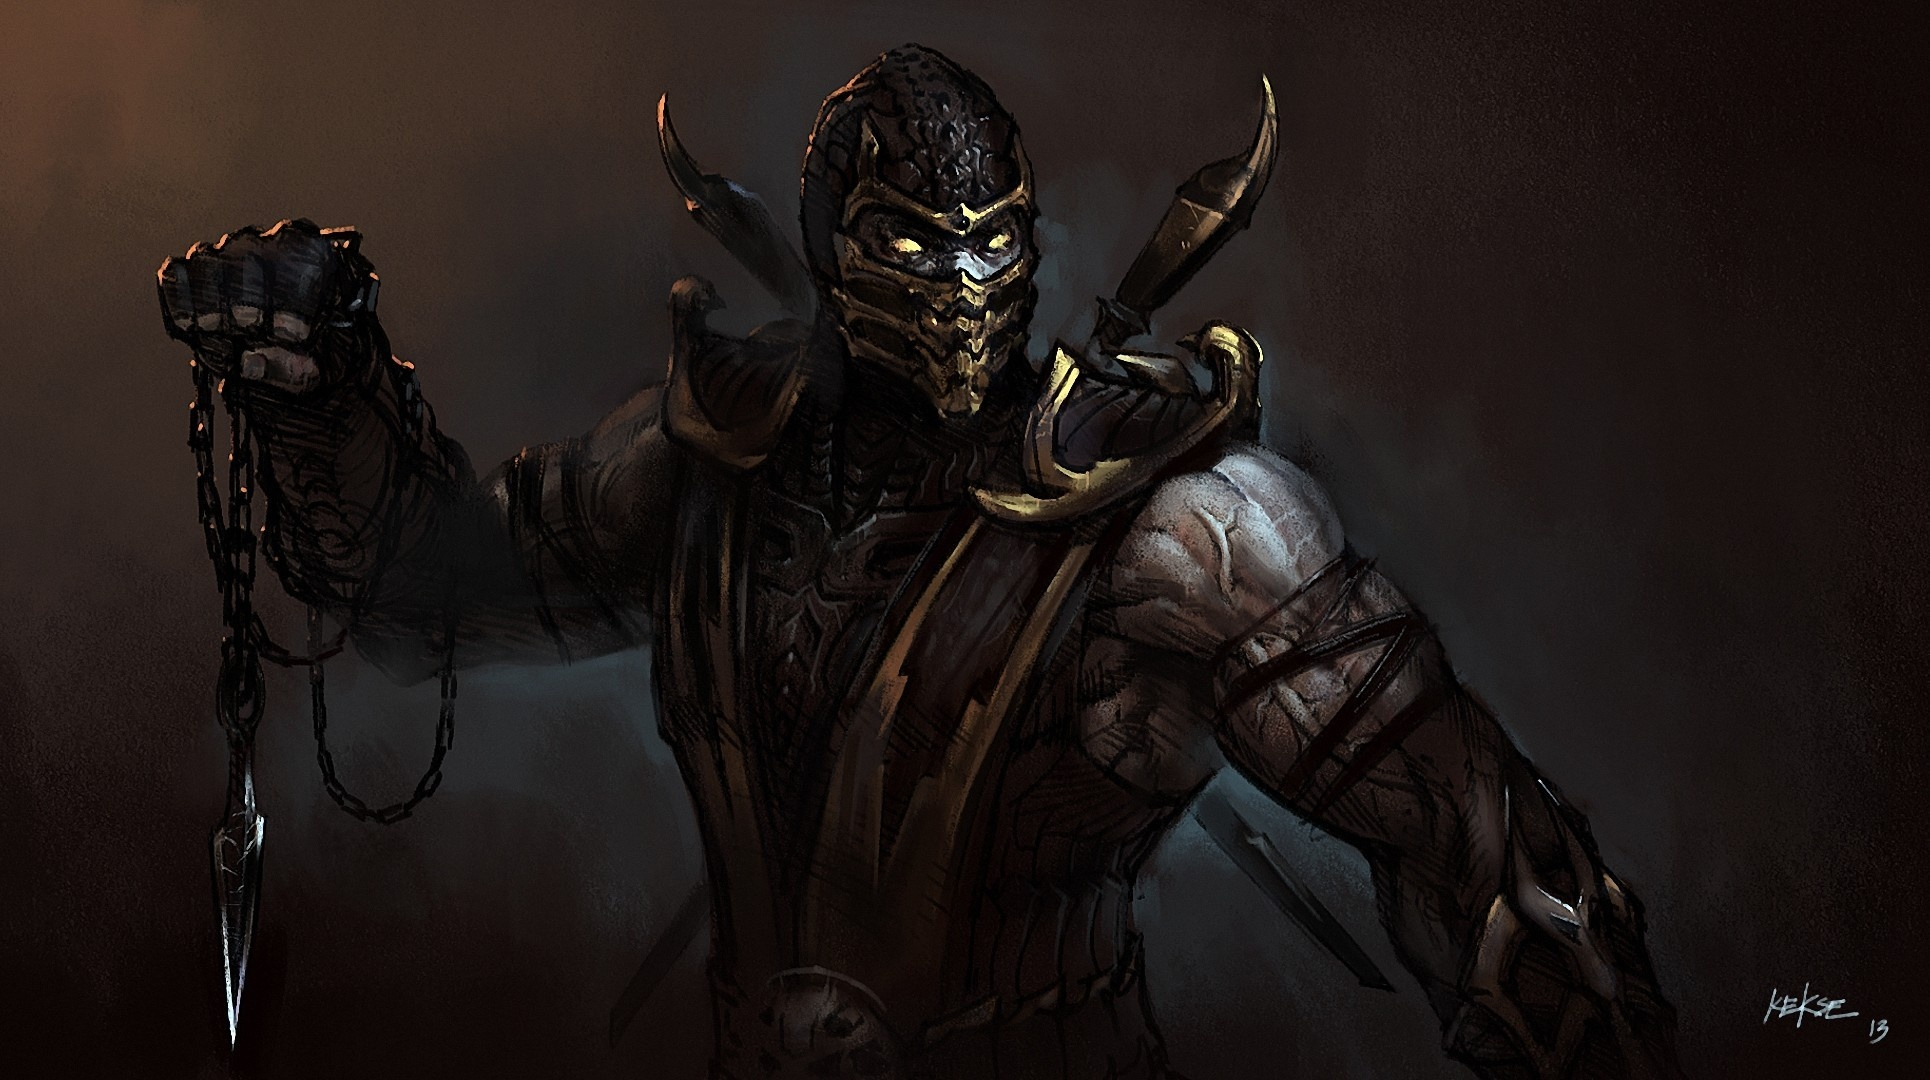 Art Chain Mask Druschie Scorpion Mortal Kombat Warrior Fantasy